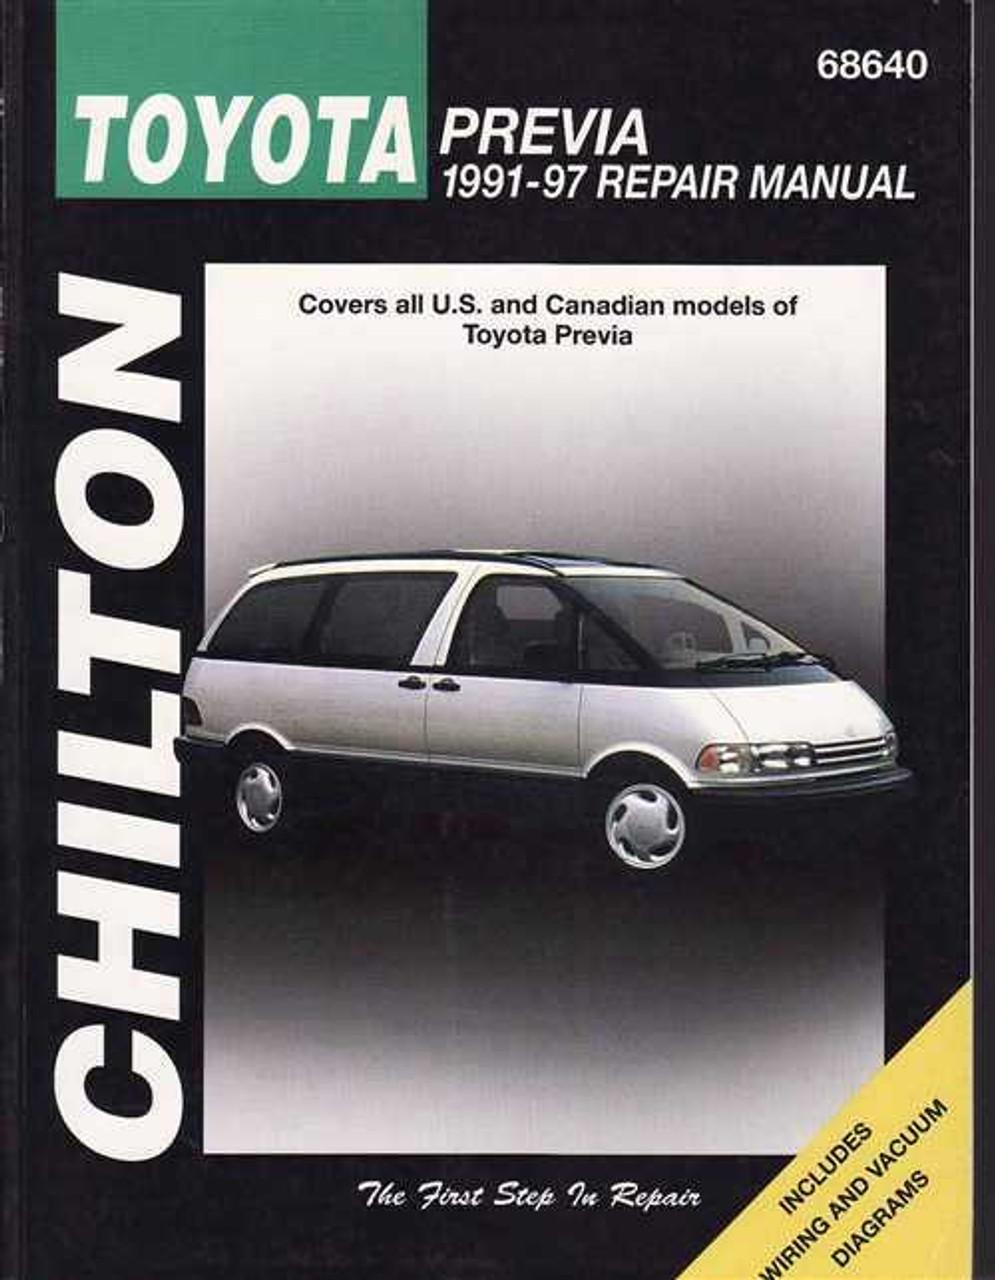 toyota tarago previa 1991 1997 workshop manual rh automotobookshop com au 1997 Toyota Supra Twin Turbo 1997 Toyota Supra Twin Turbo